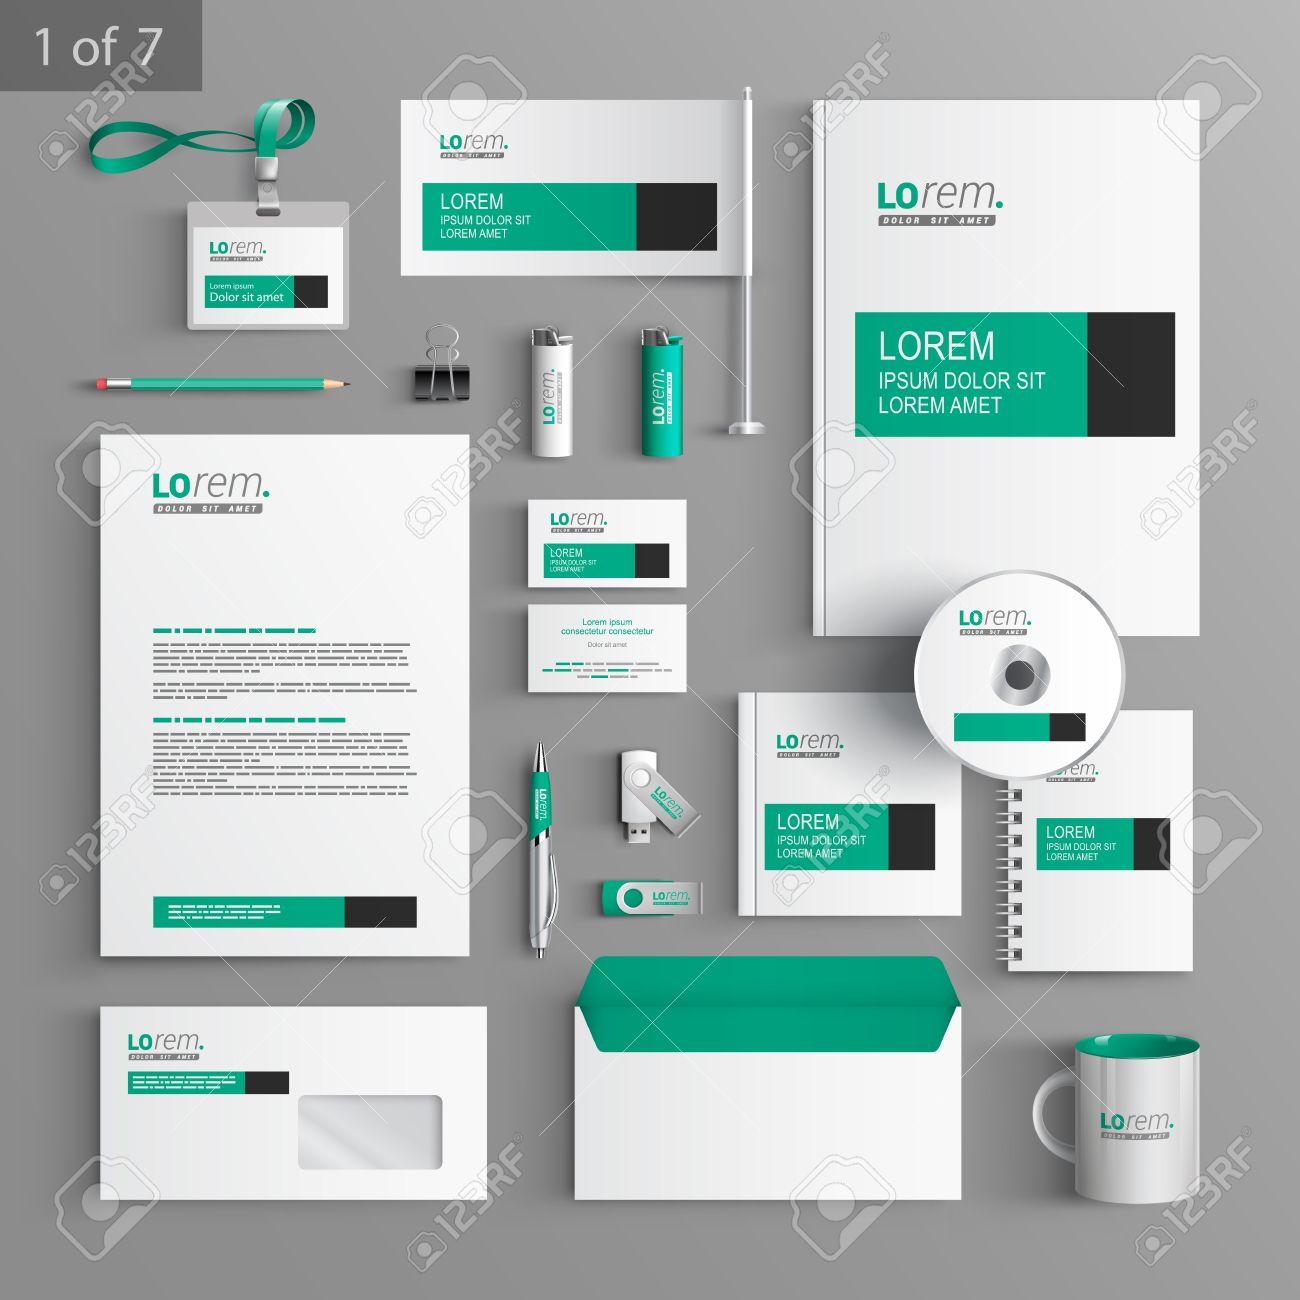 Stunning Corporate Design Template Photos - Example Resume Ideas ...